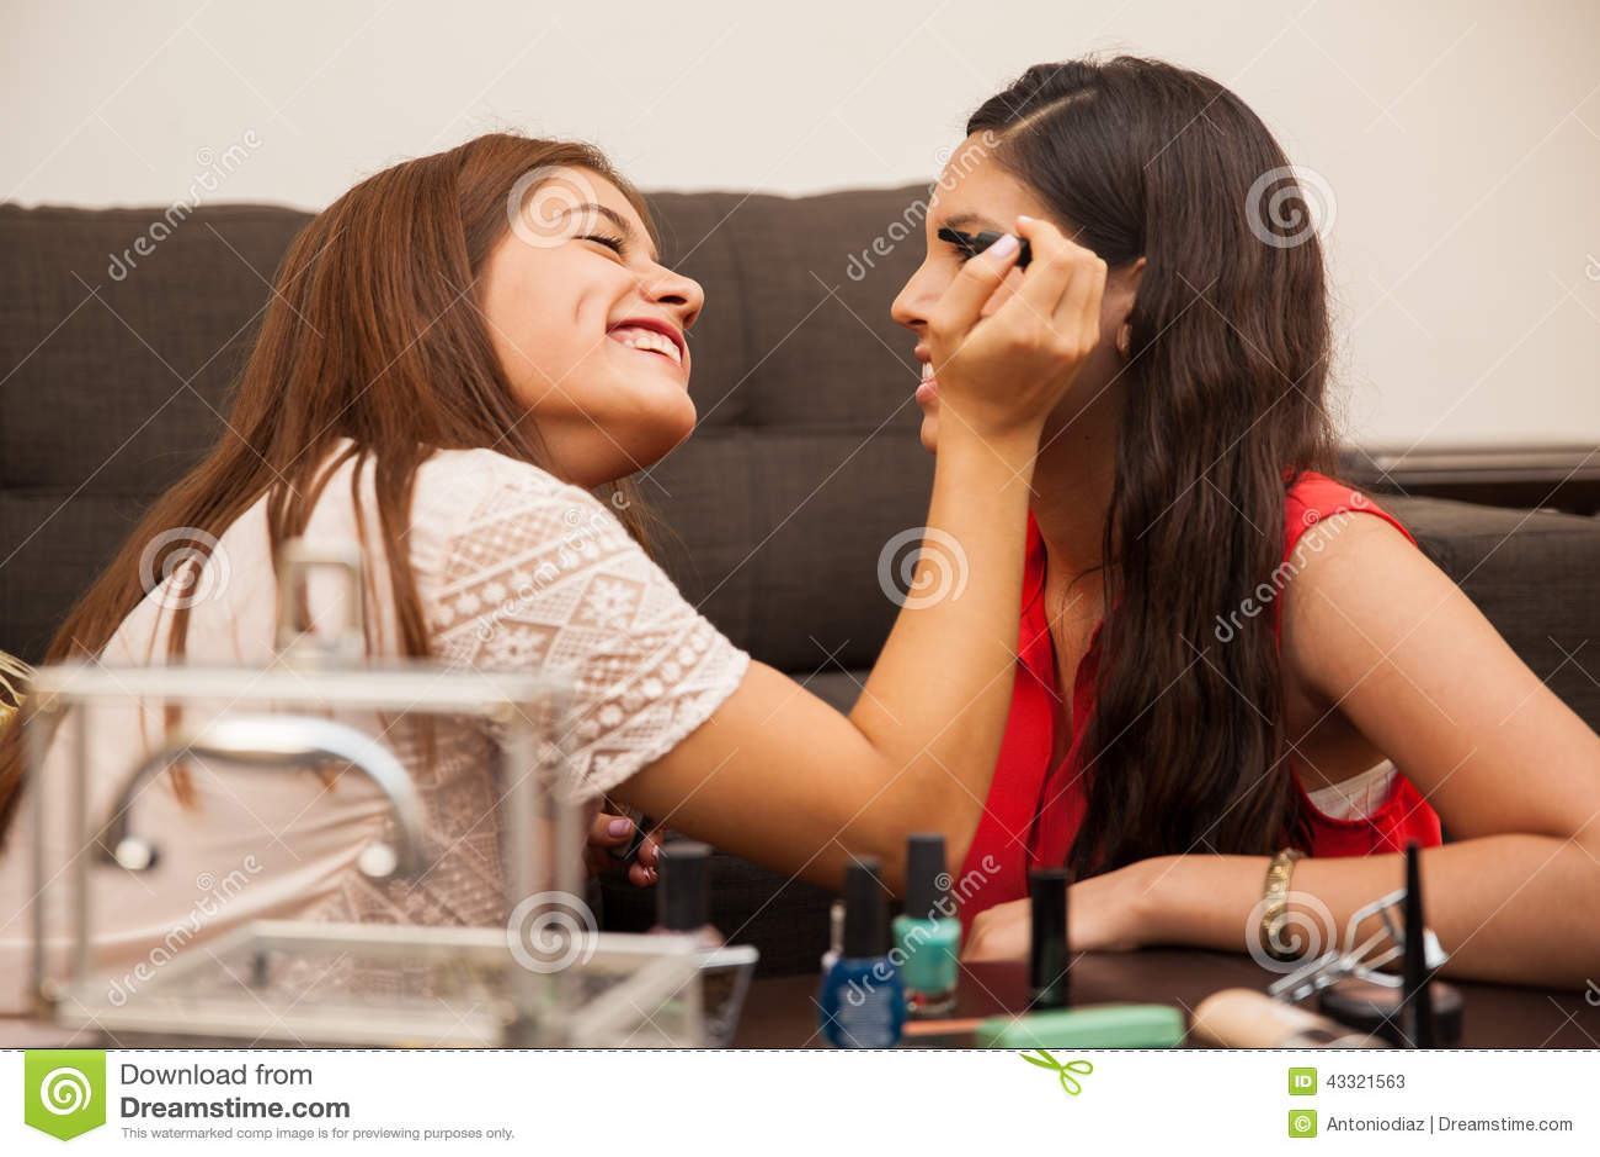 Any Cute teen girl nonude commit error